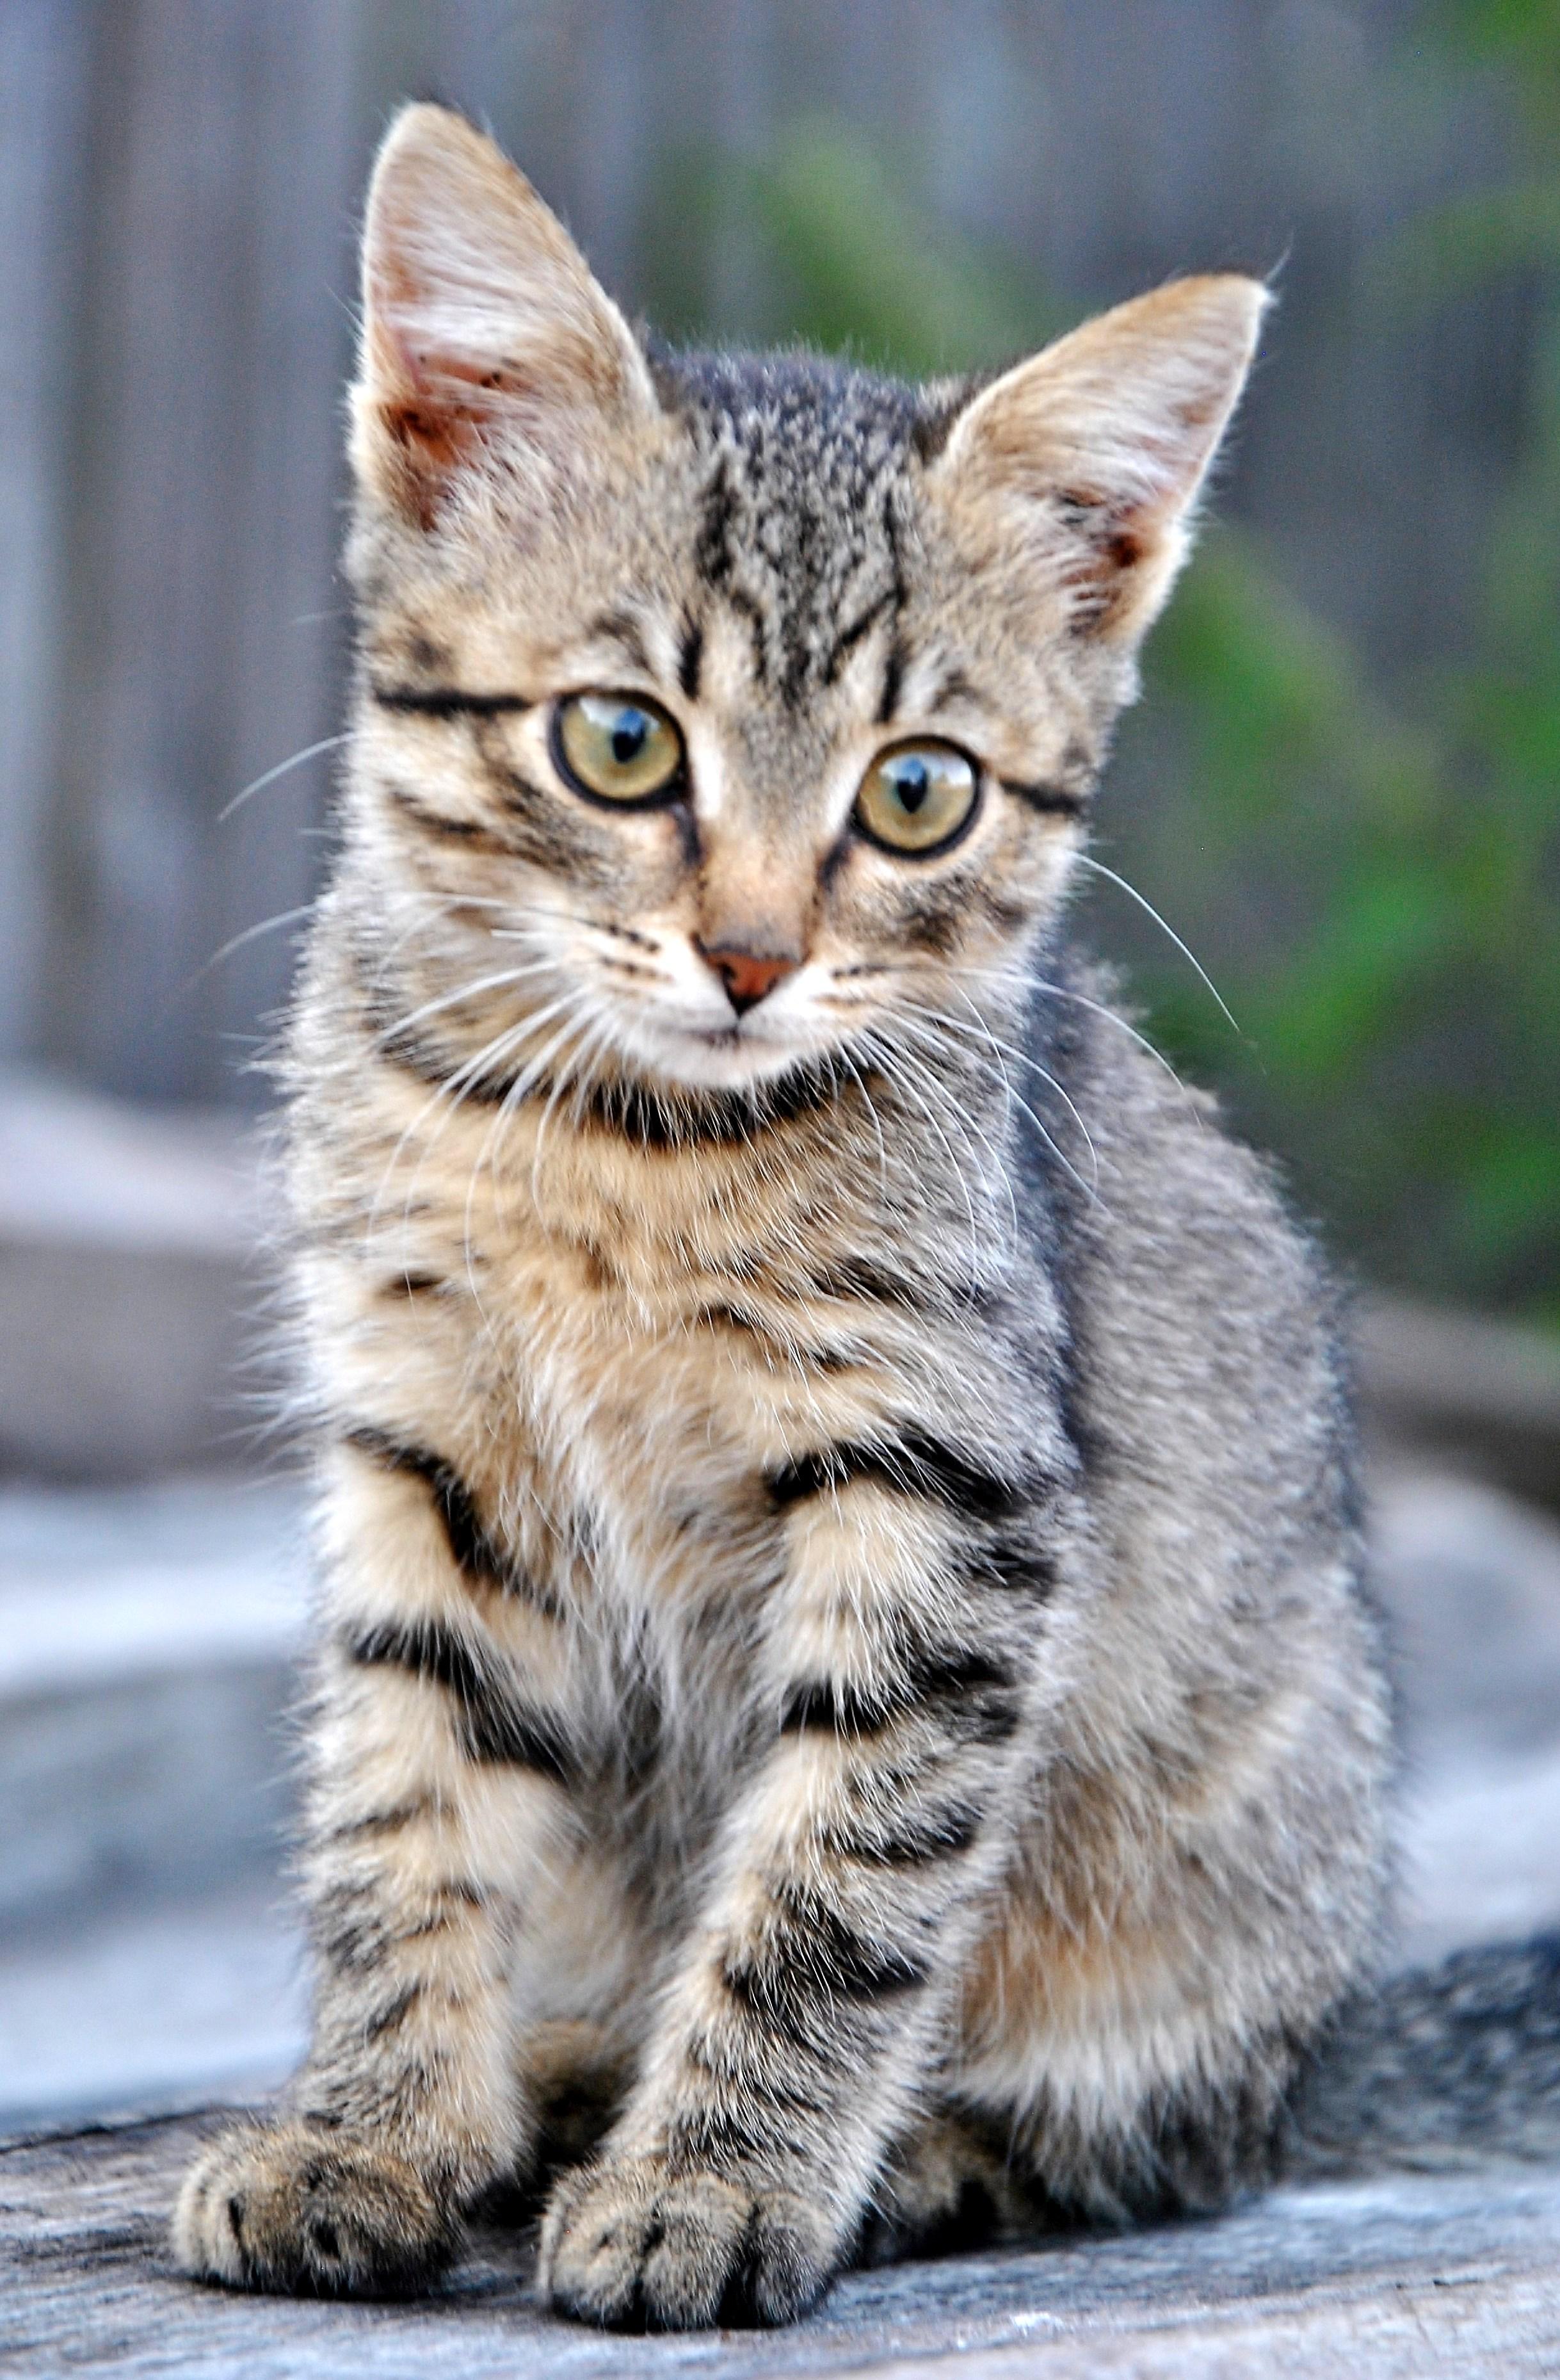 Мурлындик на прогулке. Блиц: кошки против собак